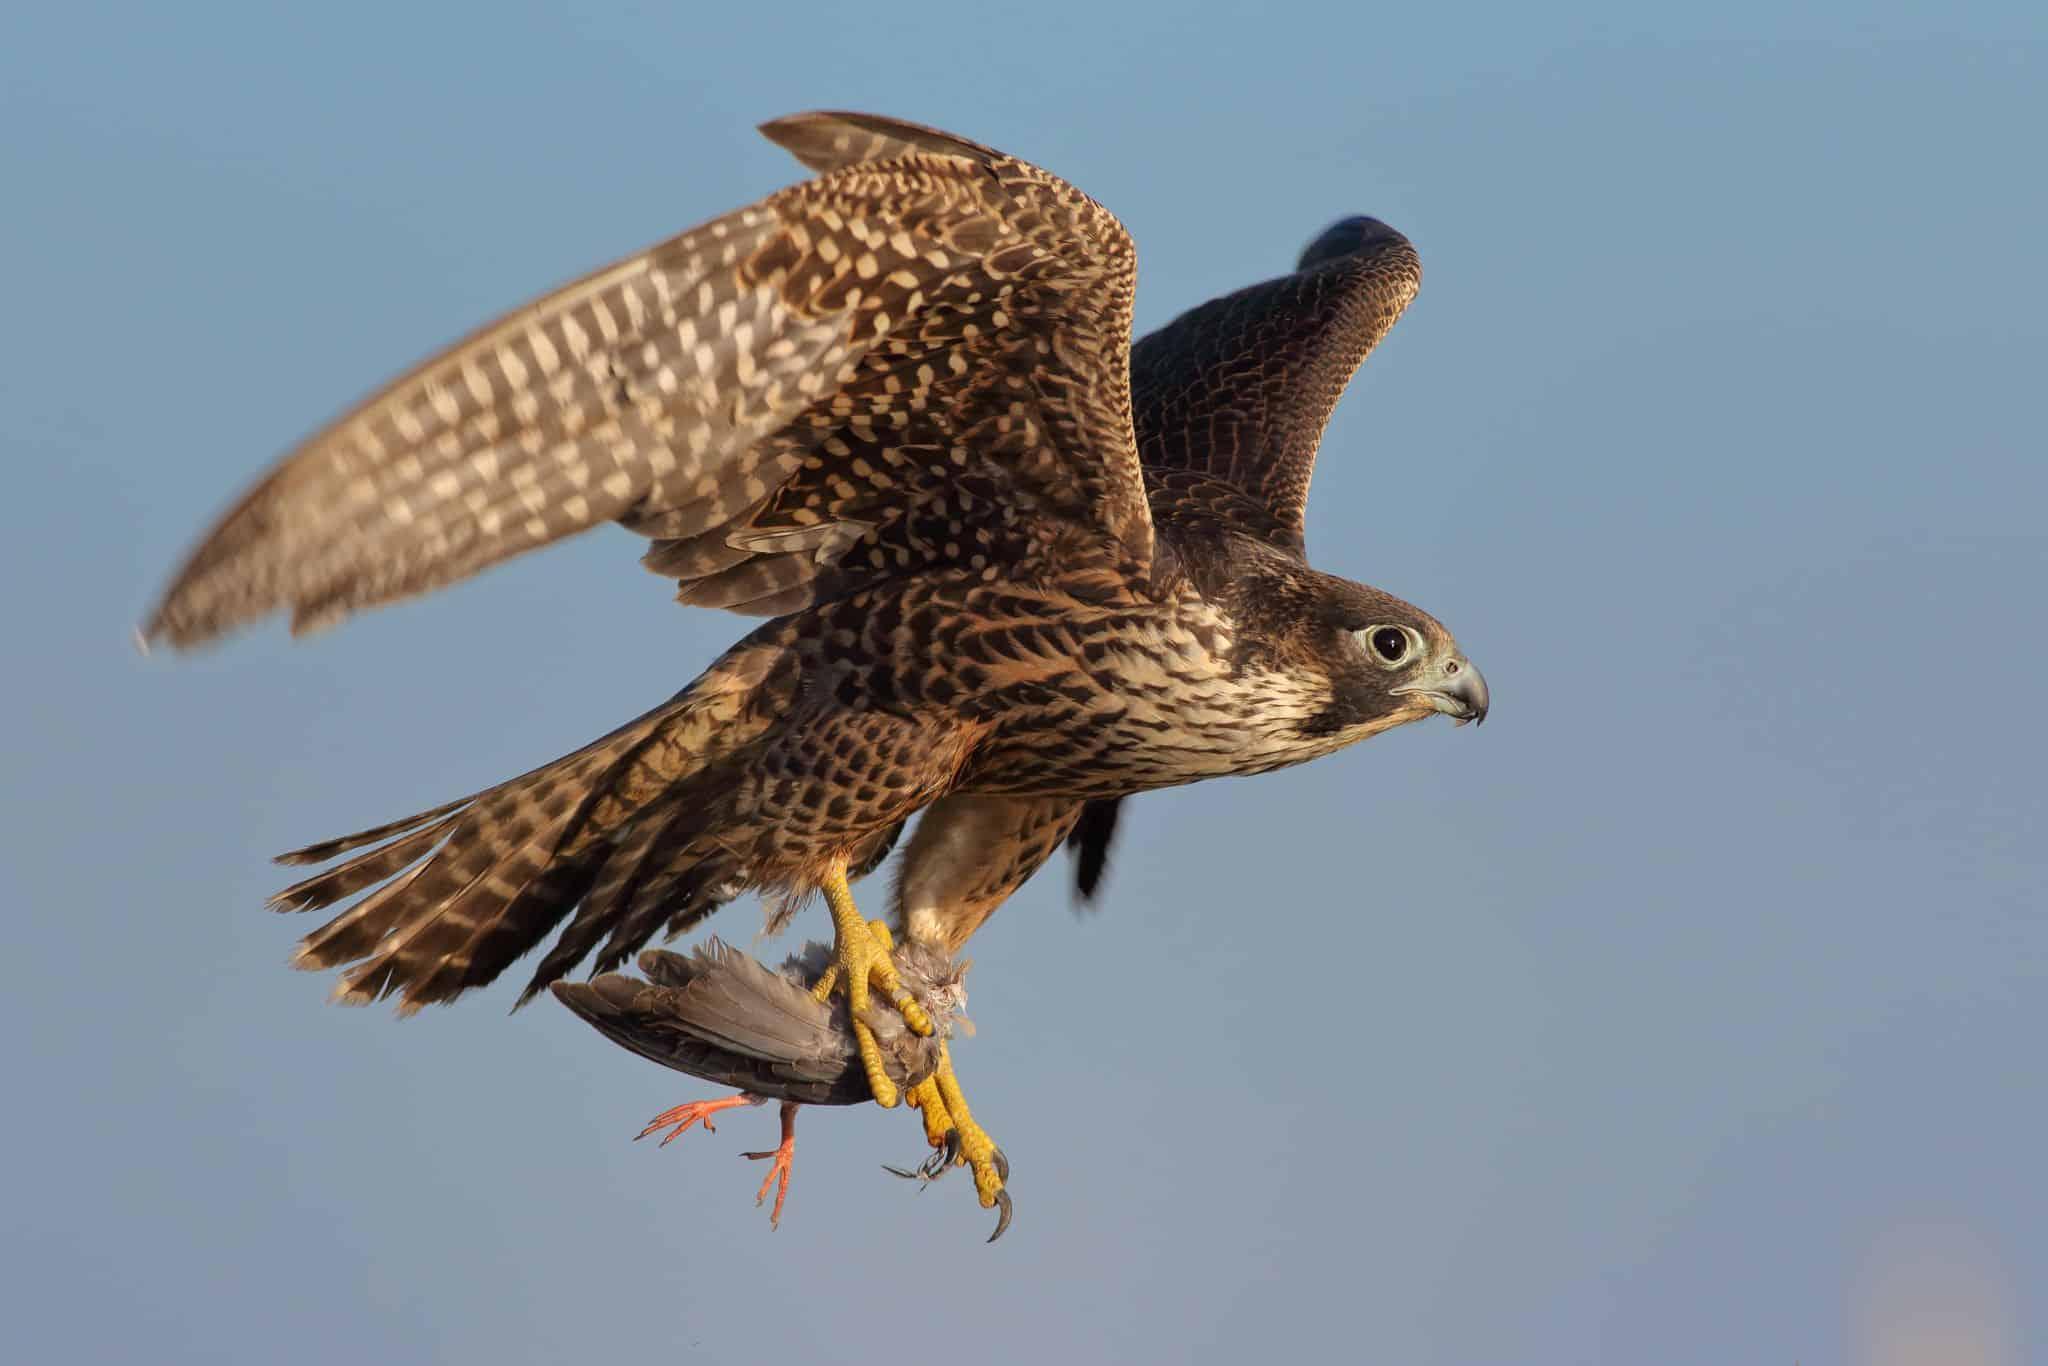 Peregrine-falcon-strike-in-the-air